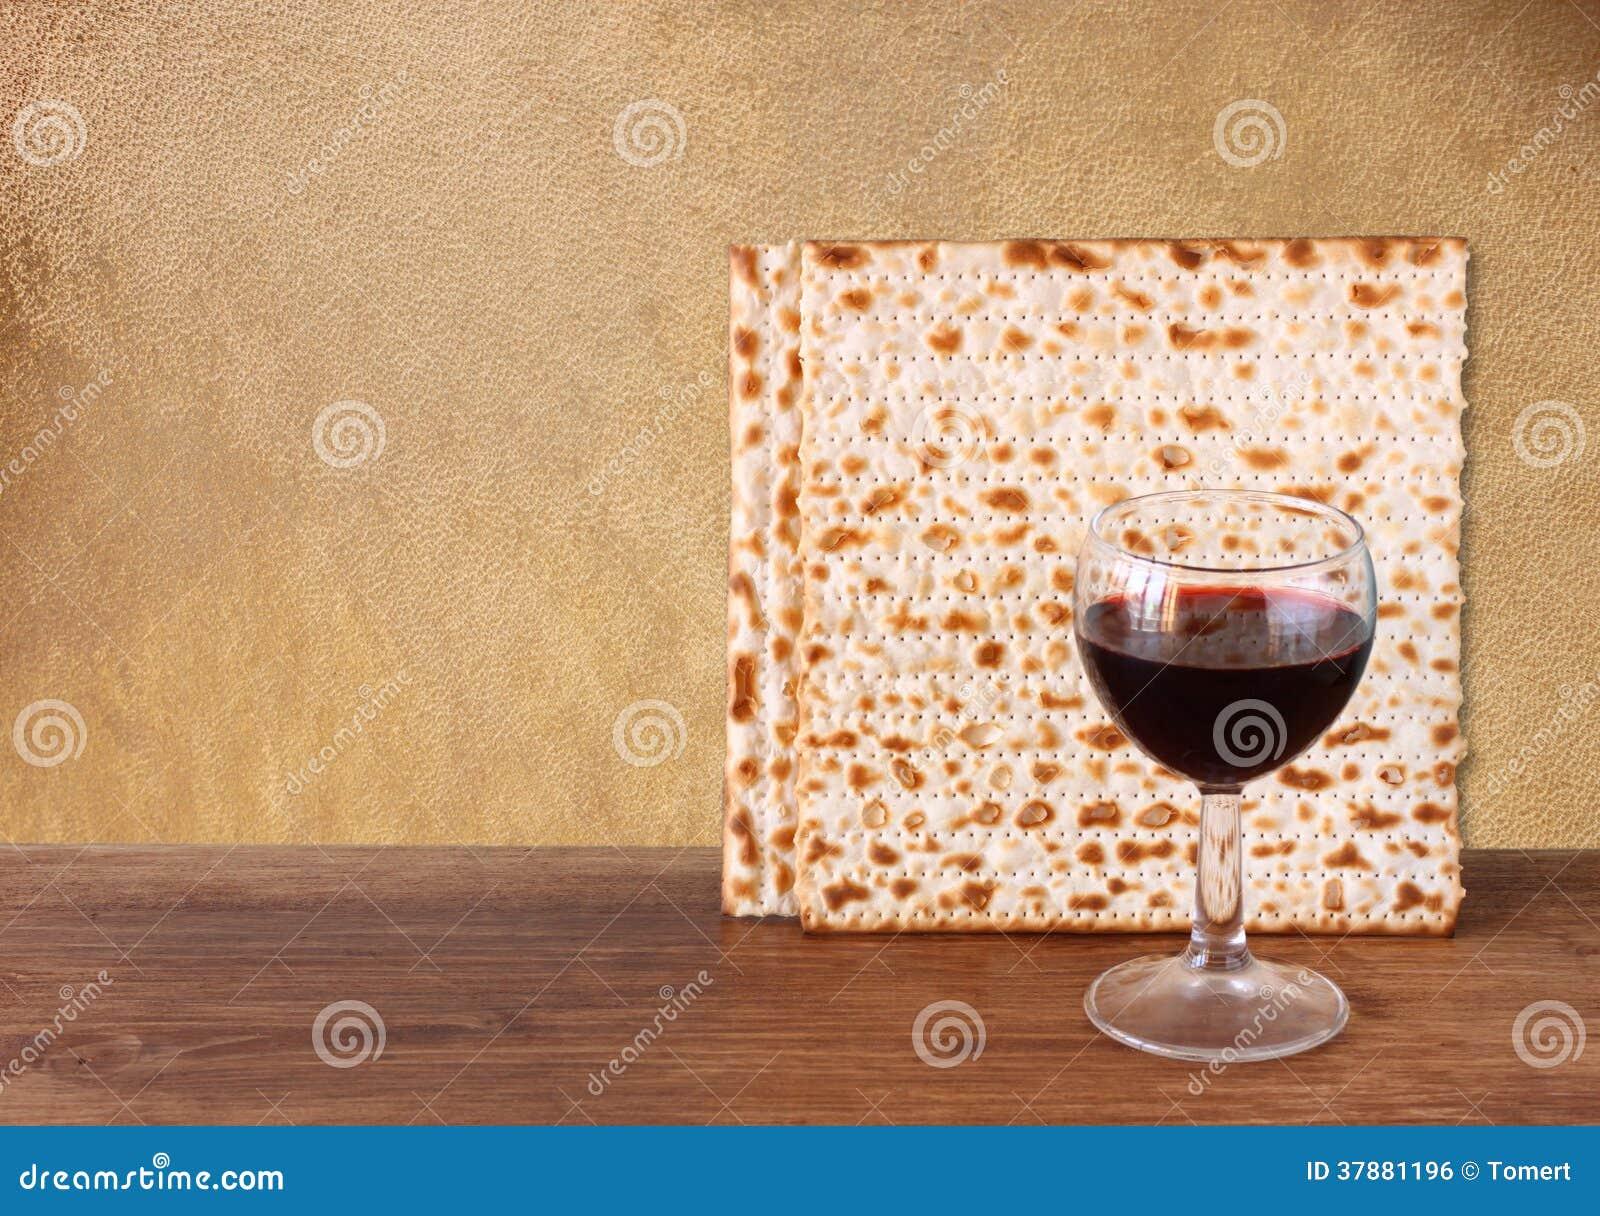 Paschaachtergrond. wijn en matzoh (Joods passoverbrood) over houten achtergrond